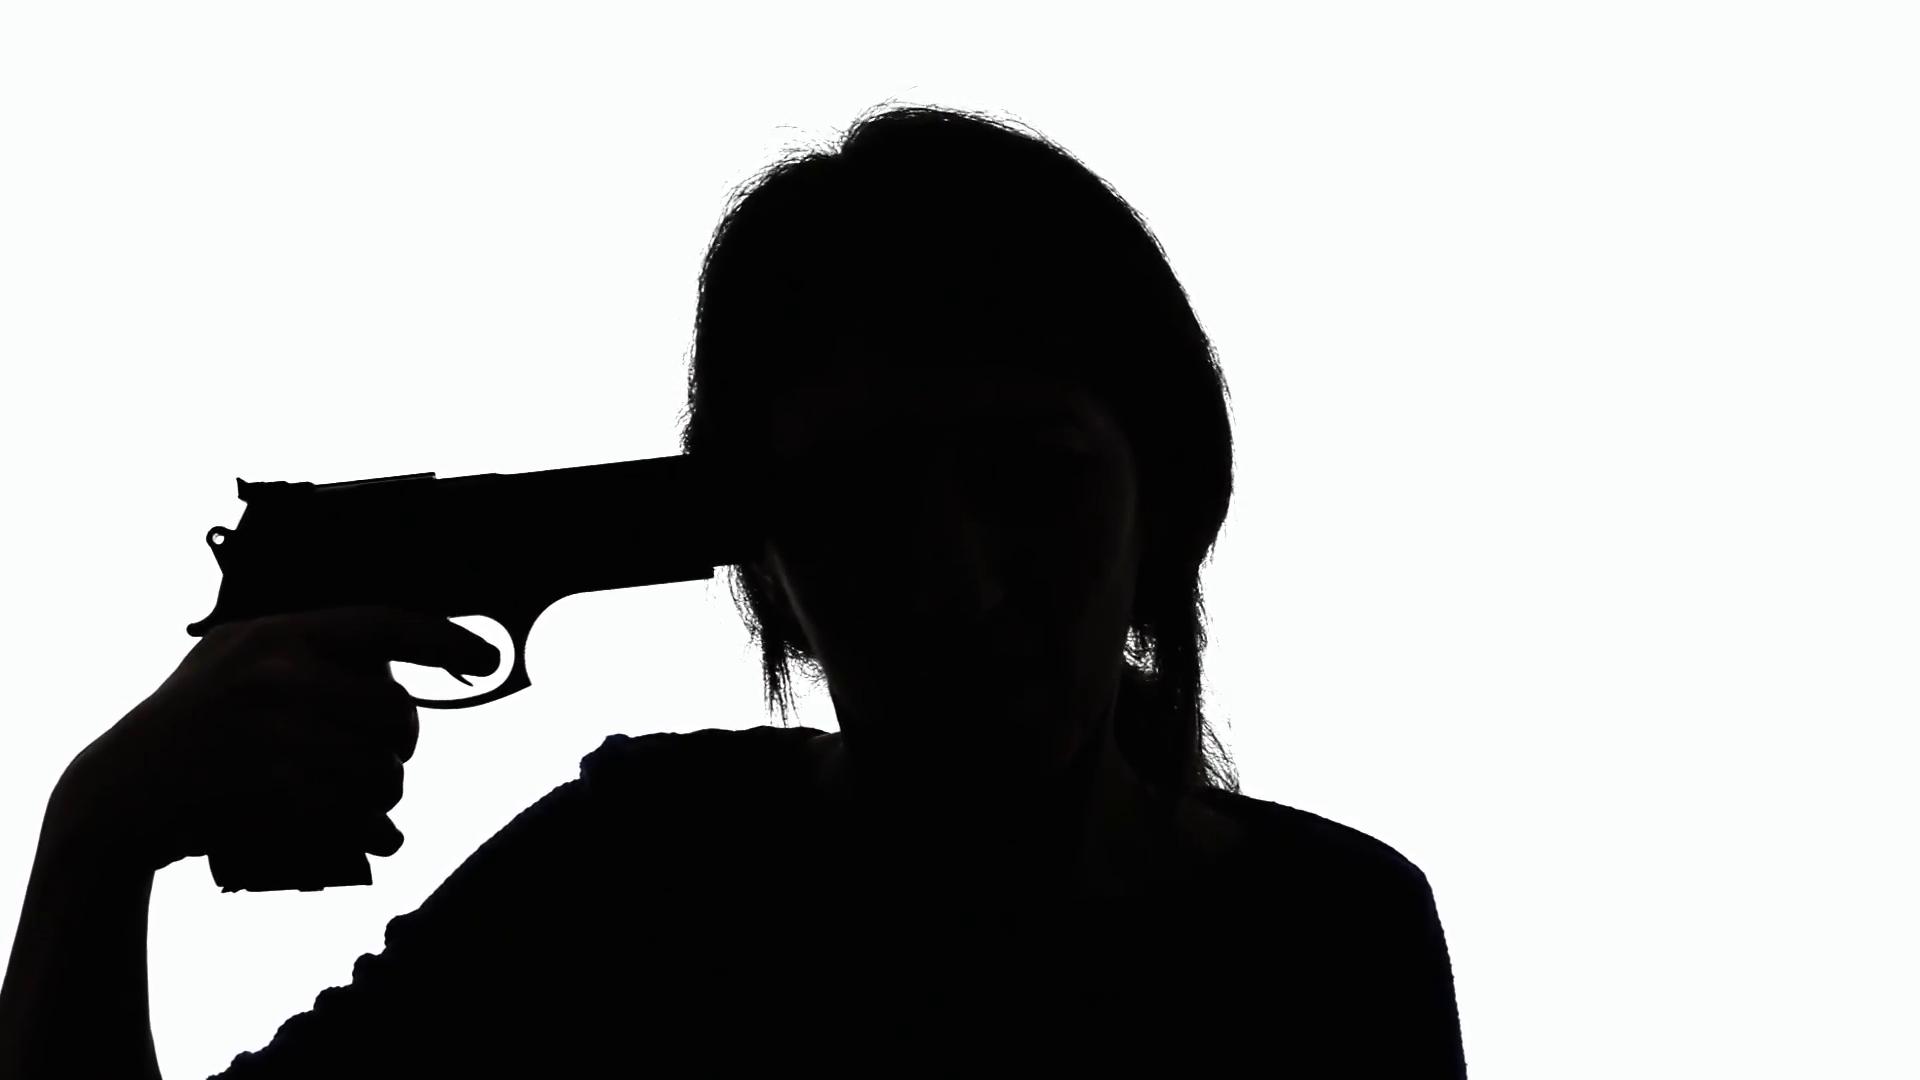 1920x1080 Silhouette Woman Gun Suicidal Red. Sad Depressed Woman Taking